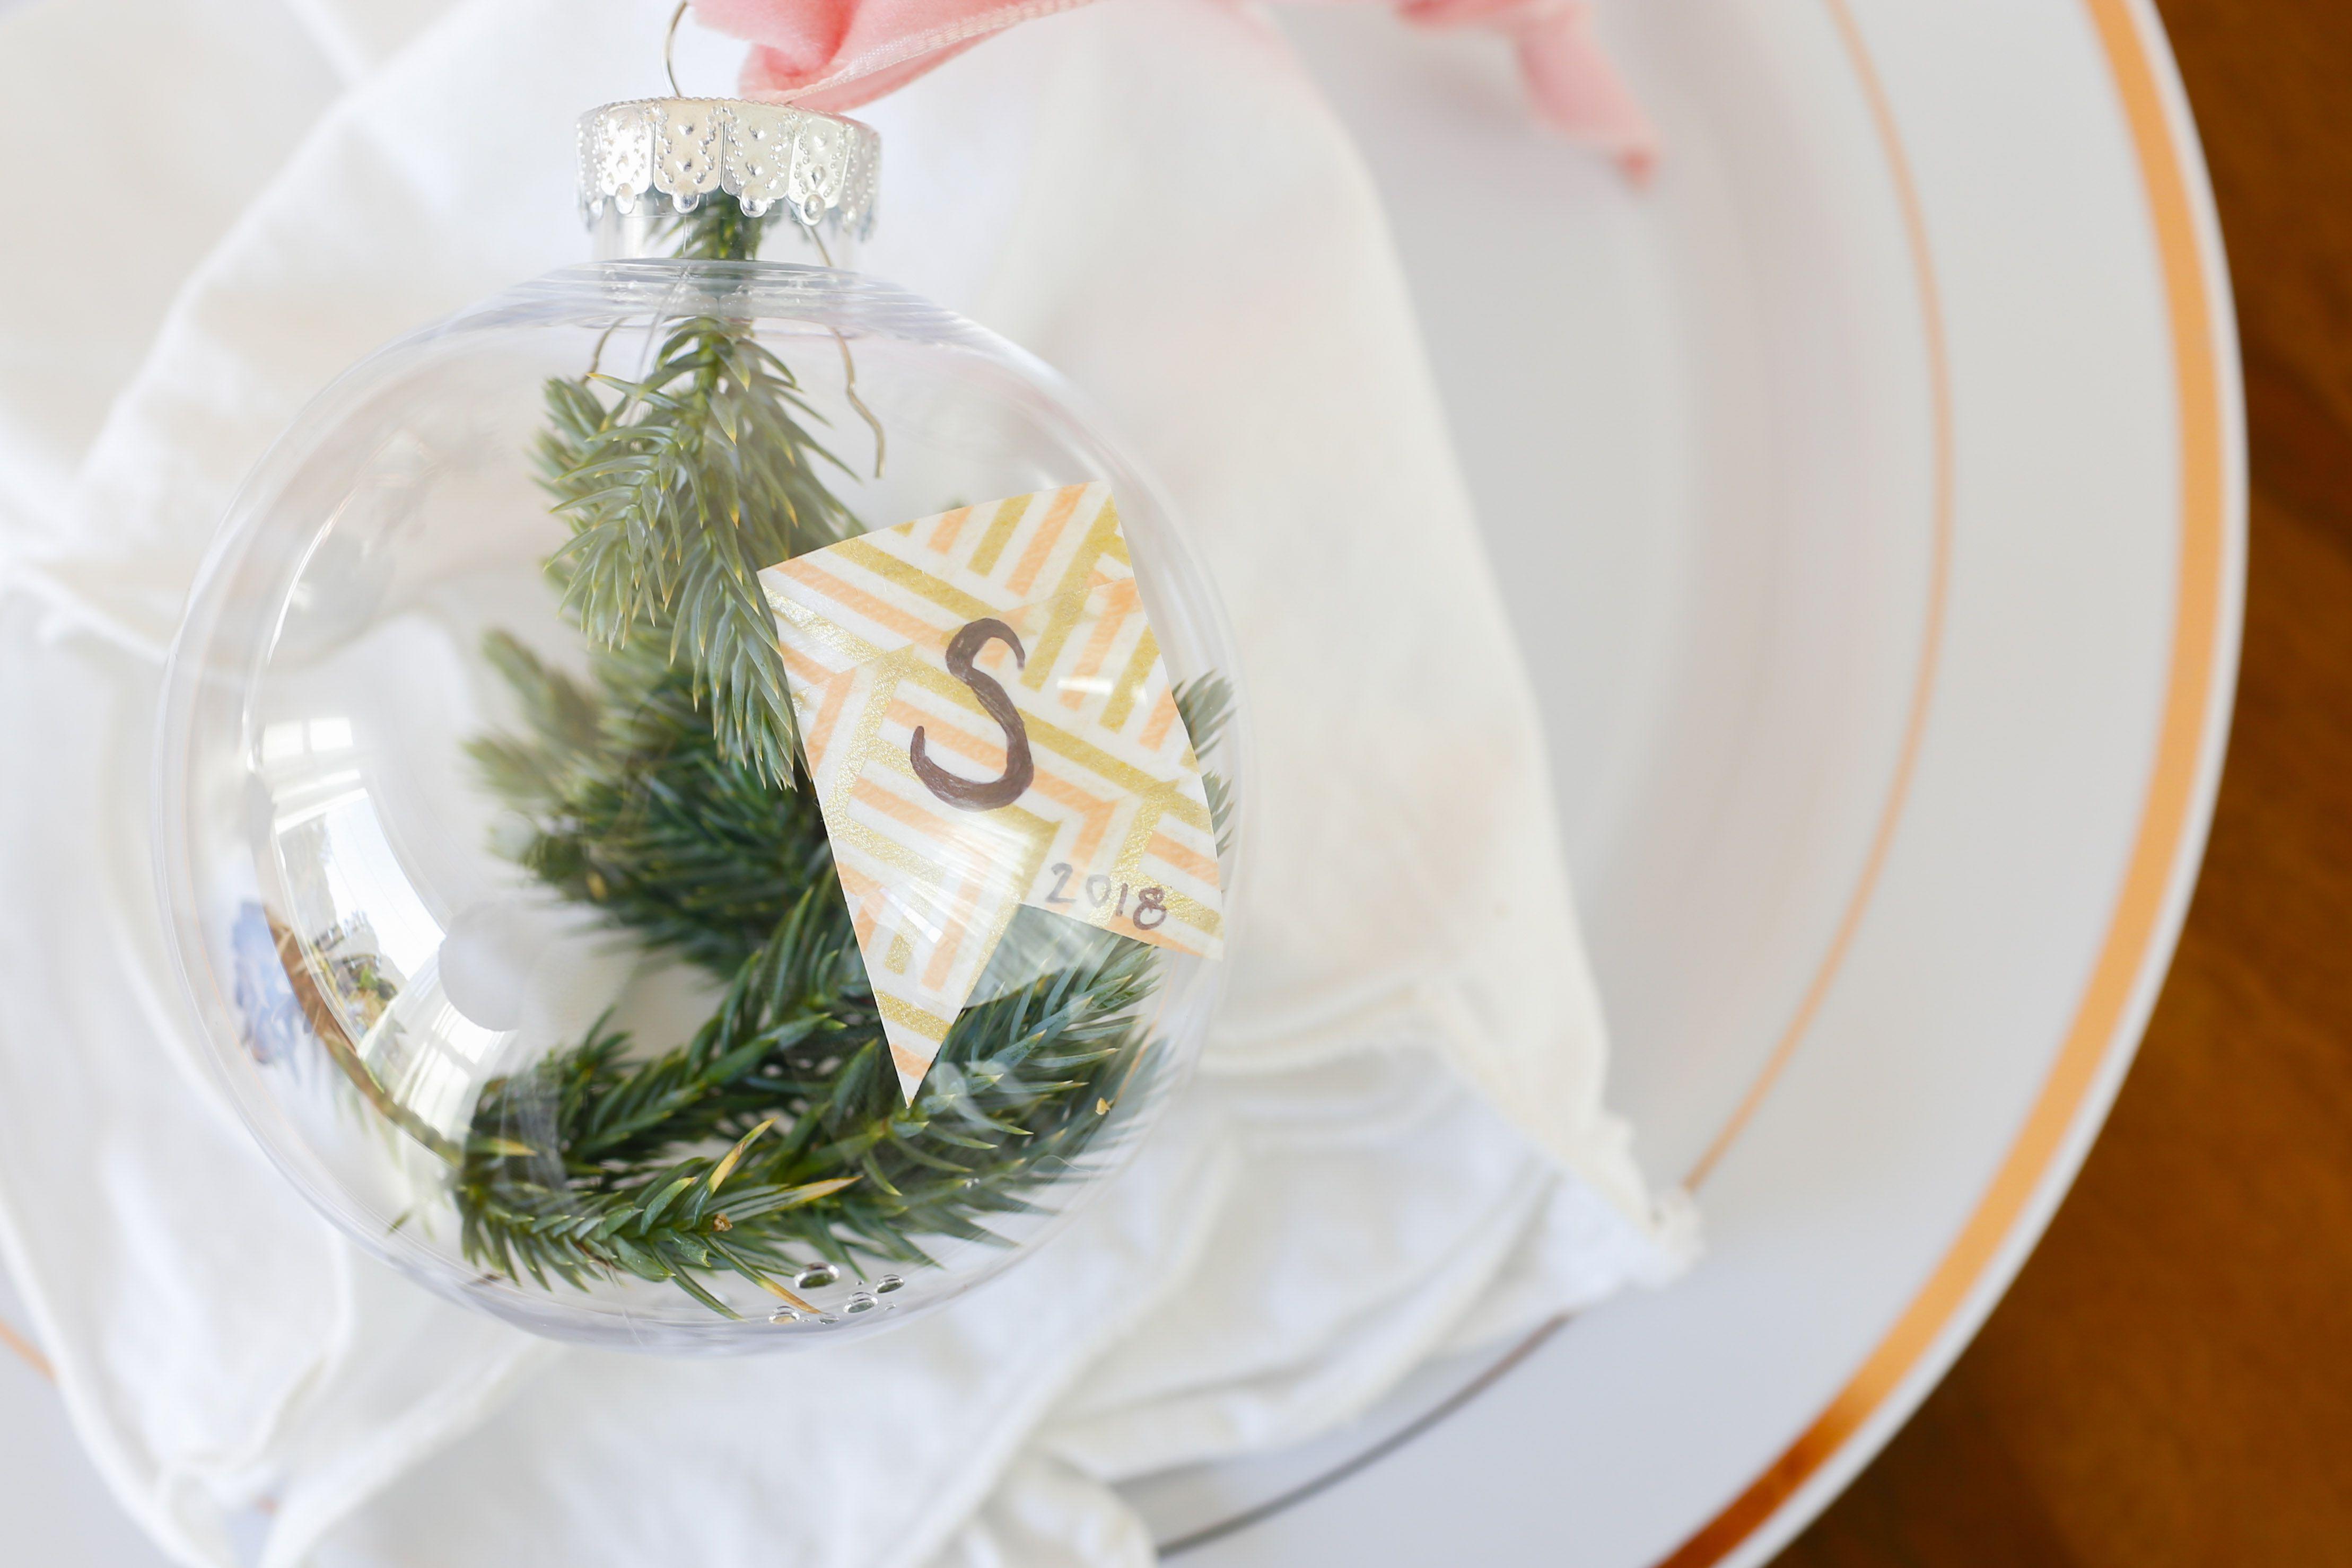 DIY Christmas Ornament Place Cards